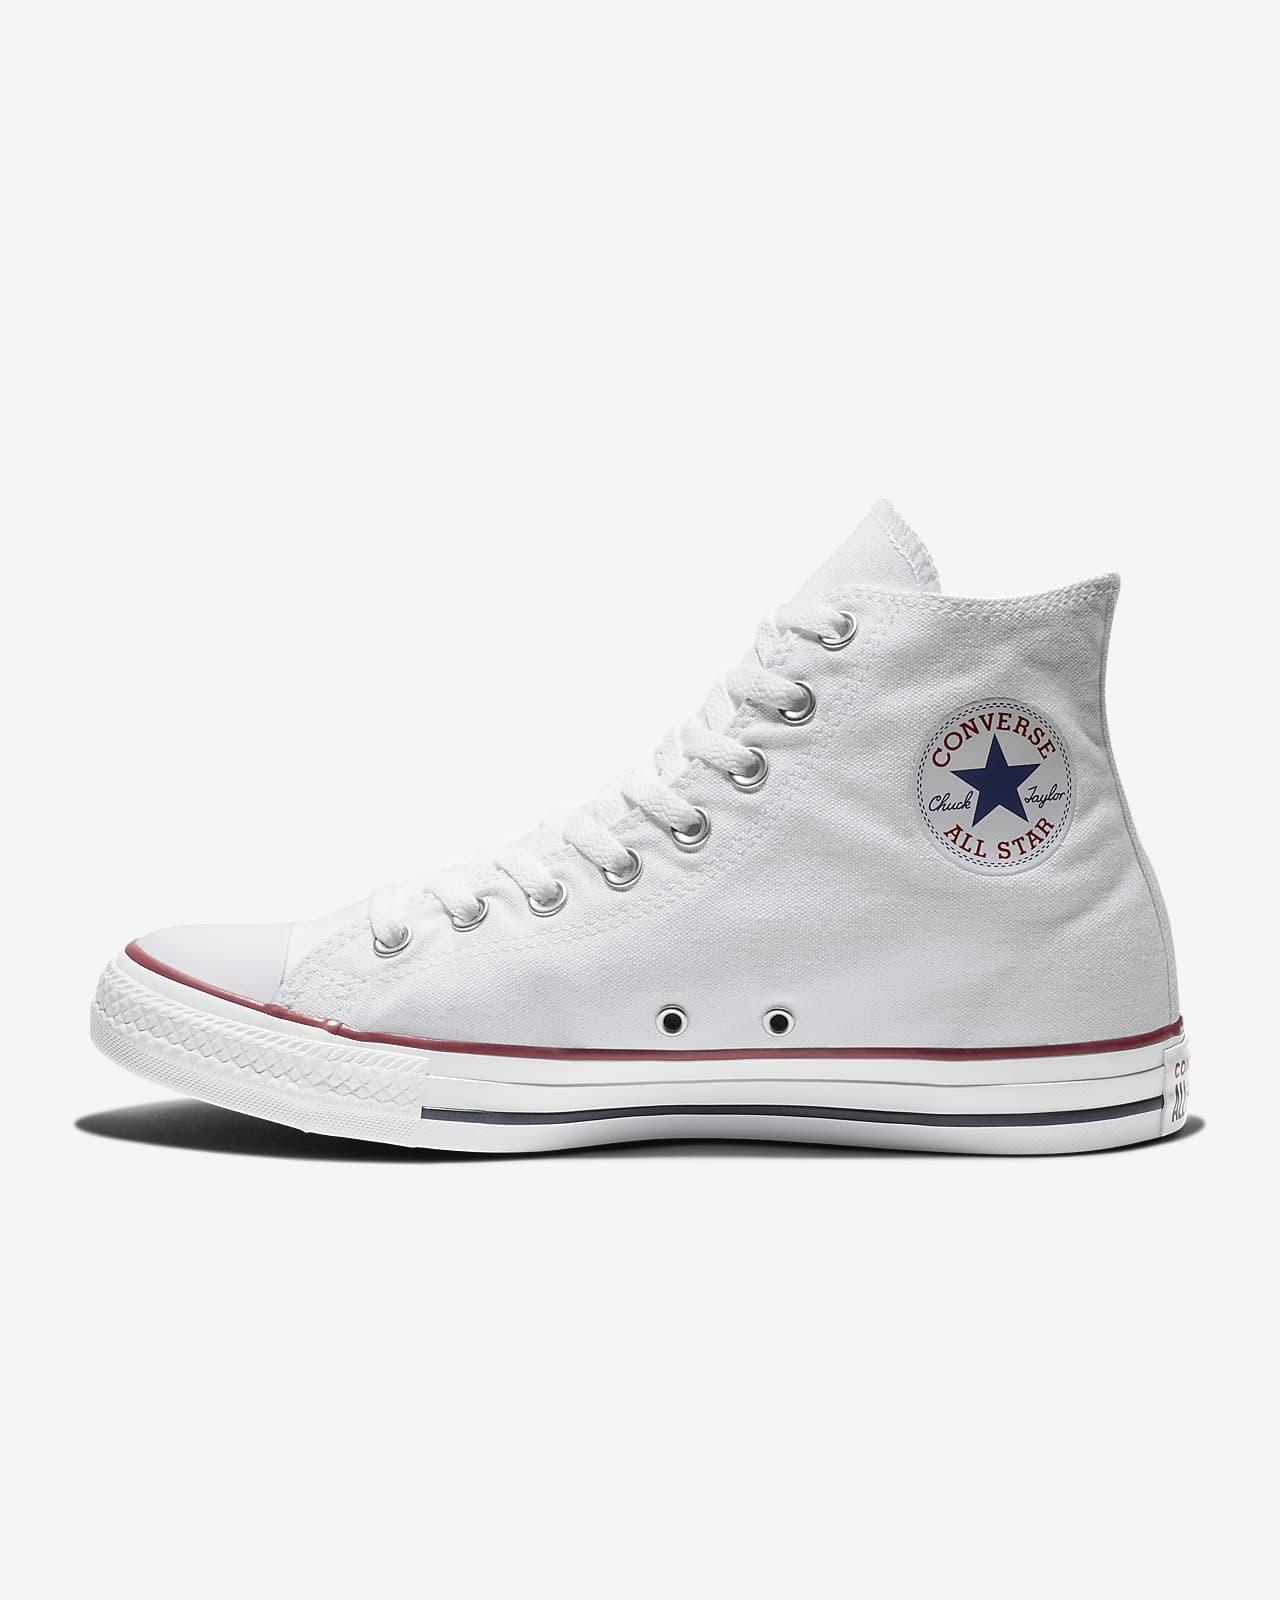 all.star converse